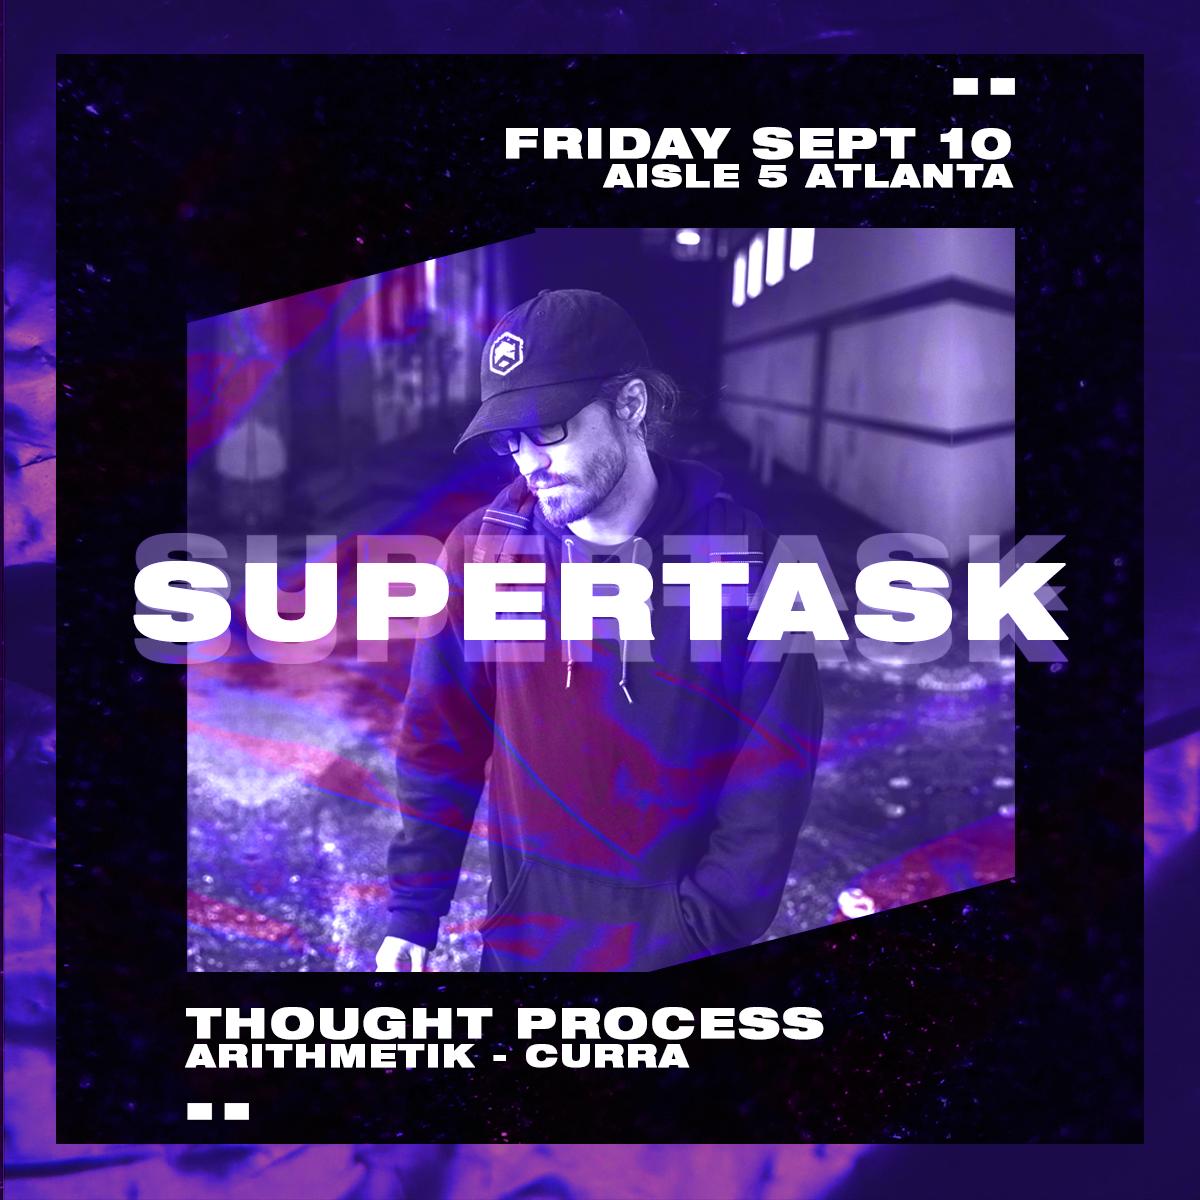 Supertask: Main Image